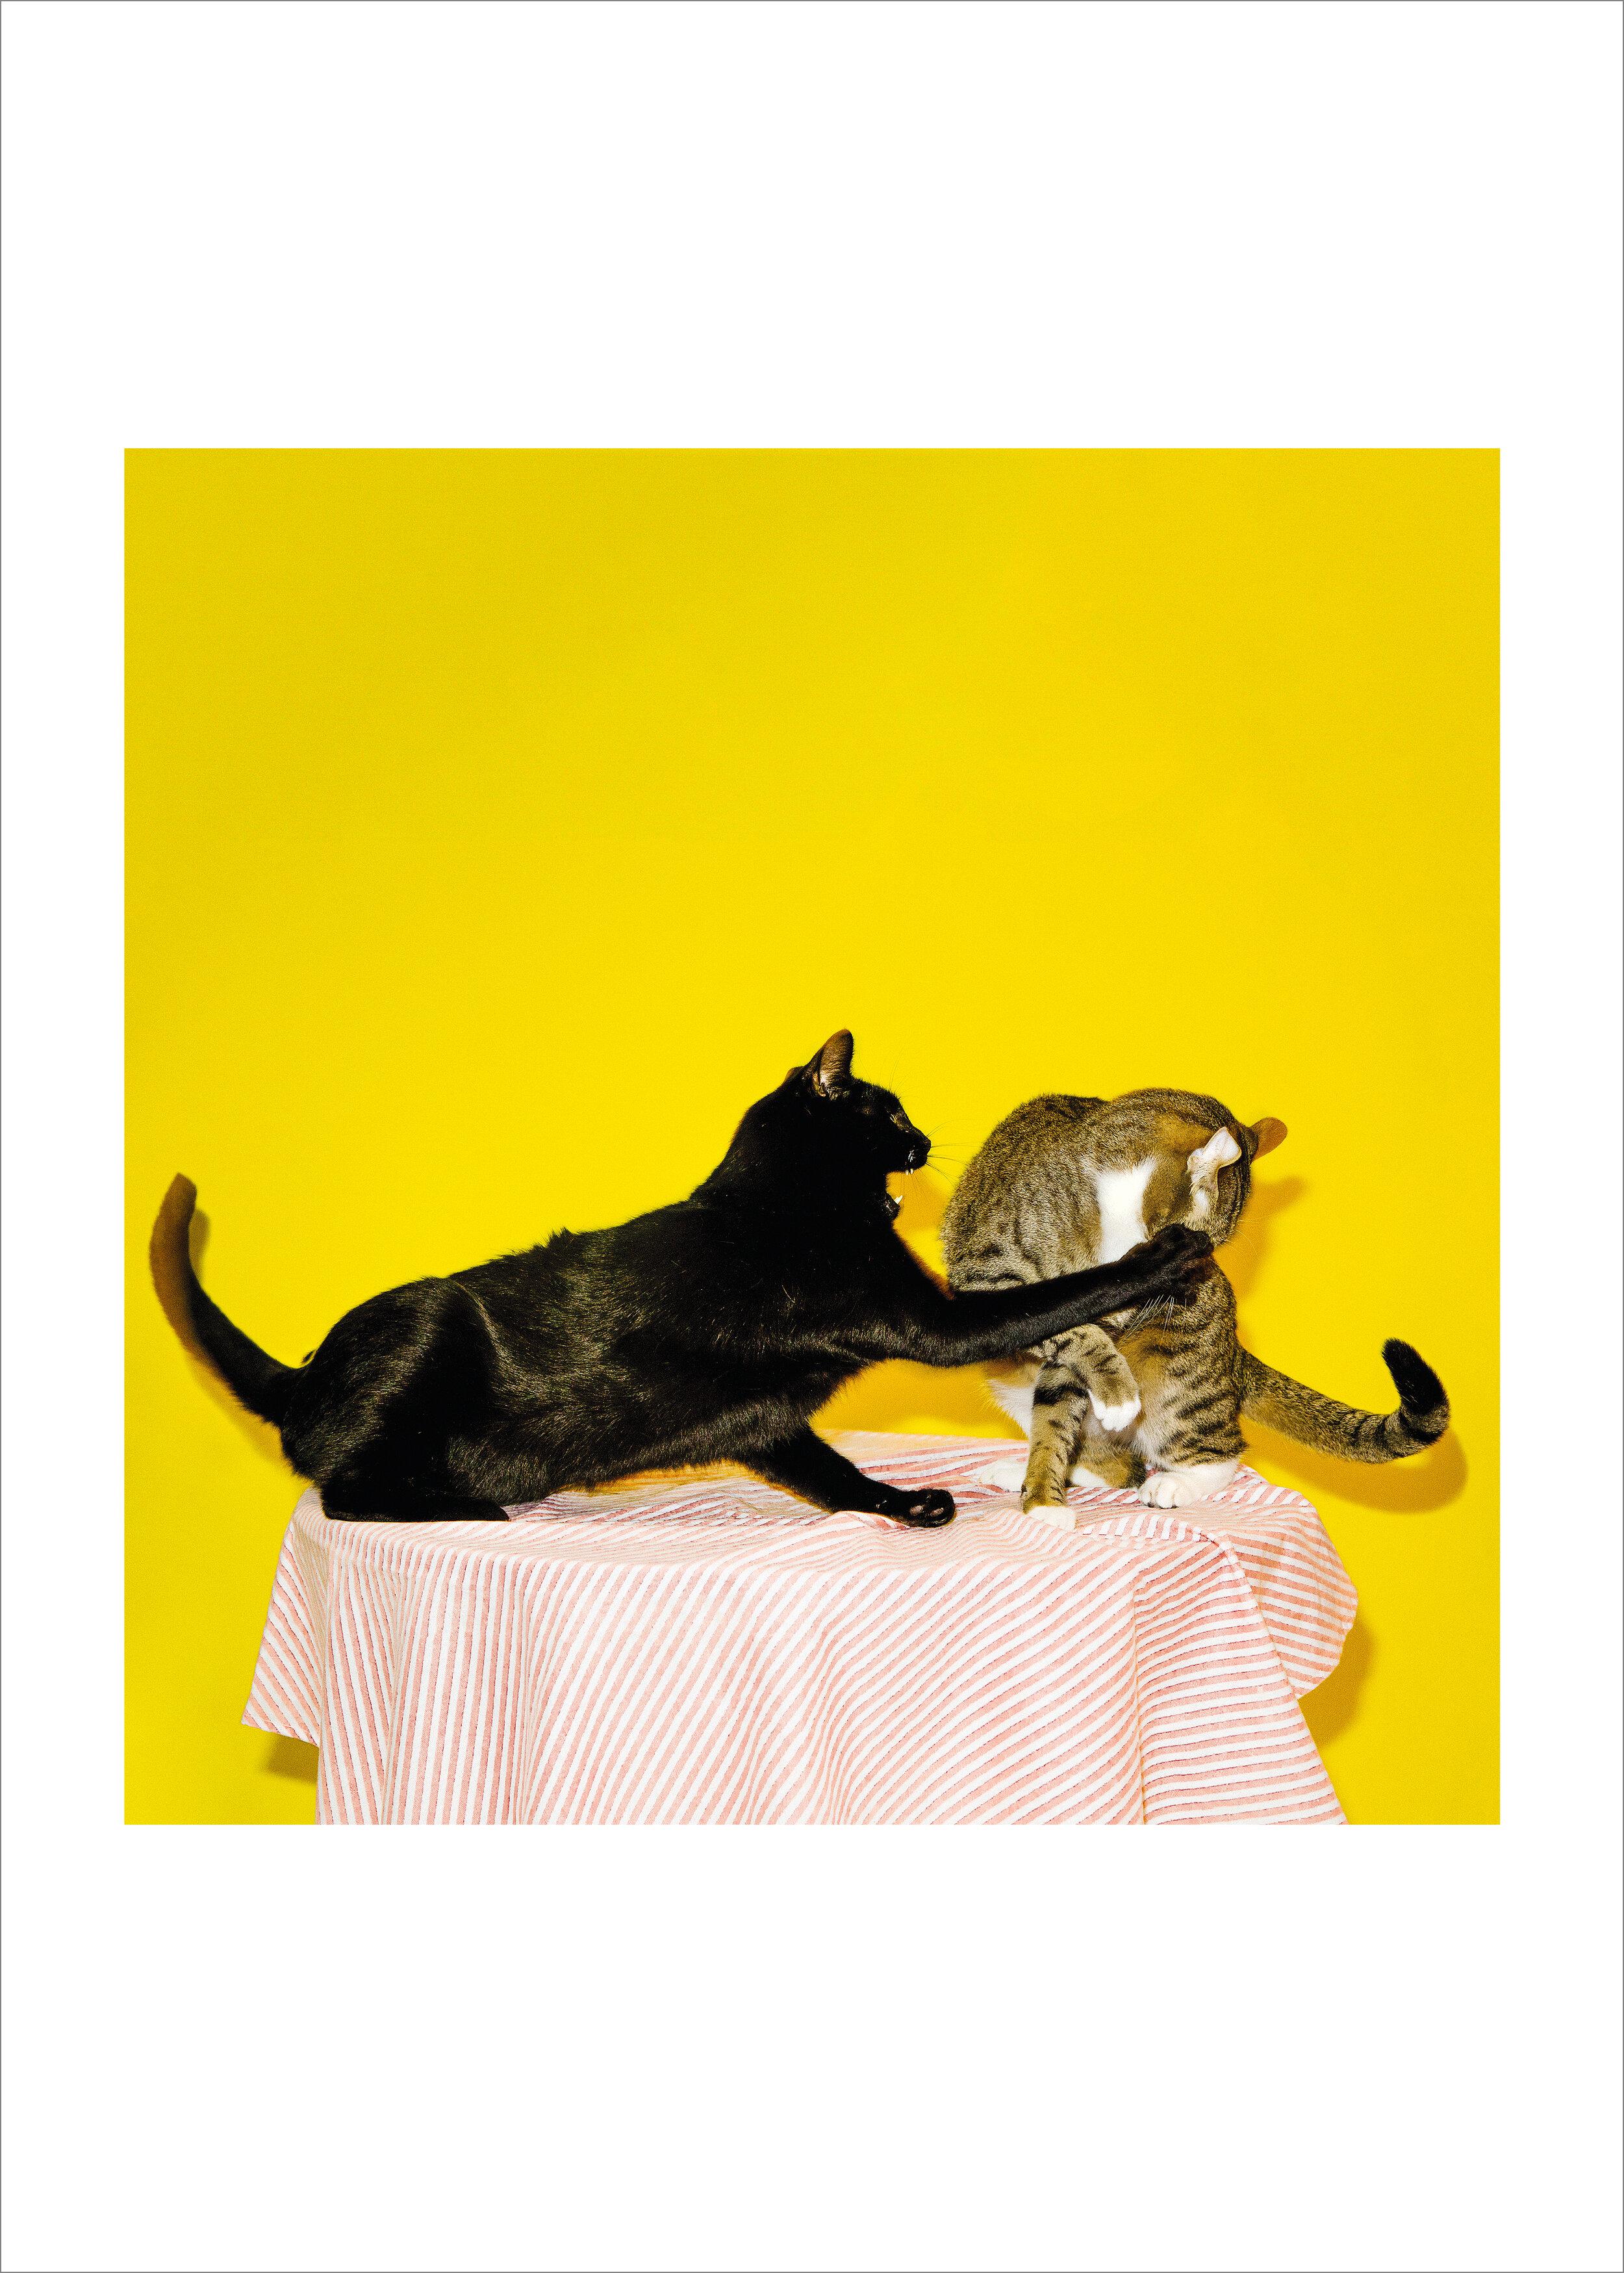 cats fighting.jpg